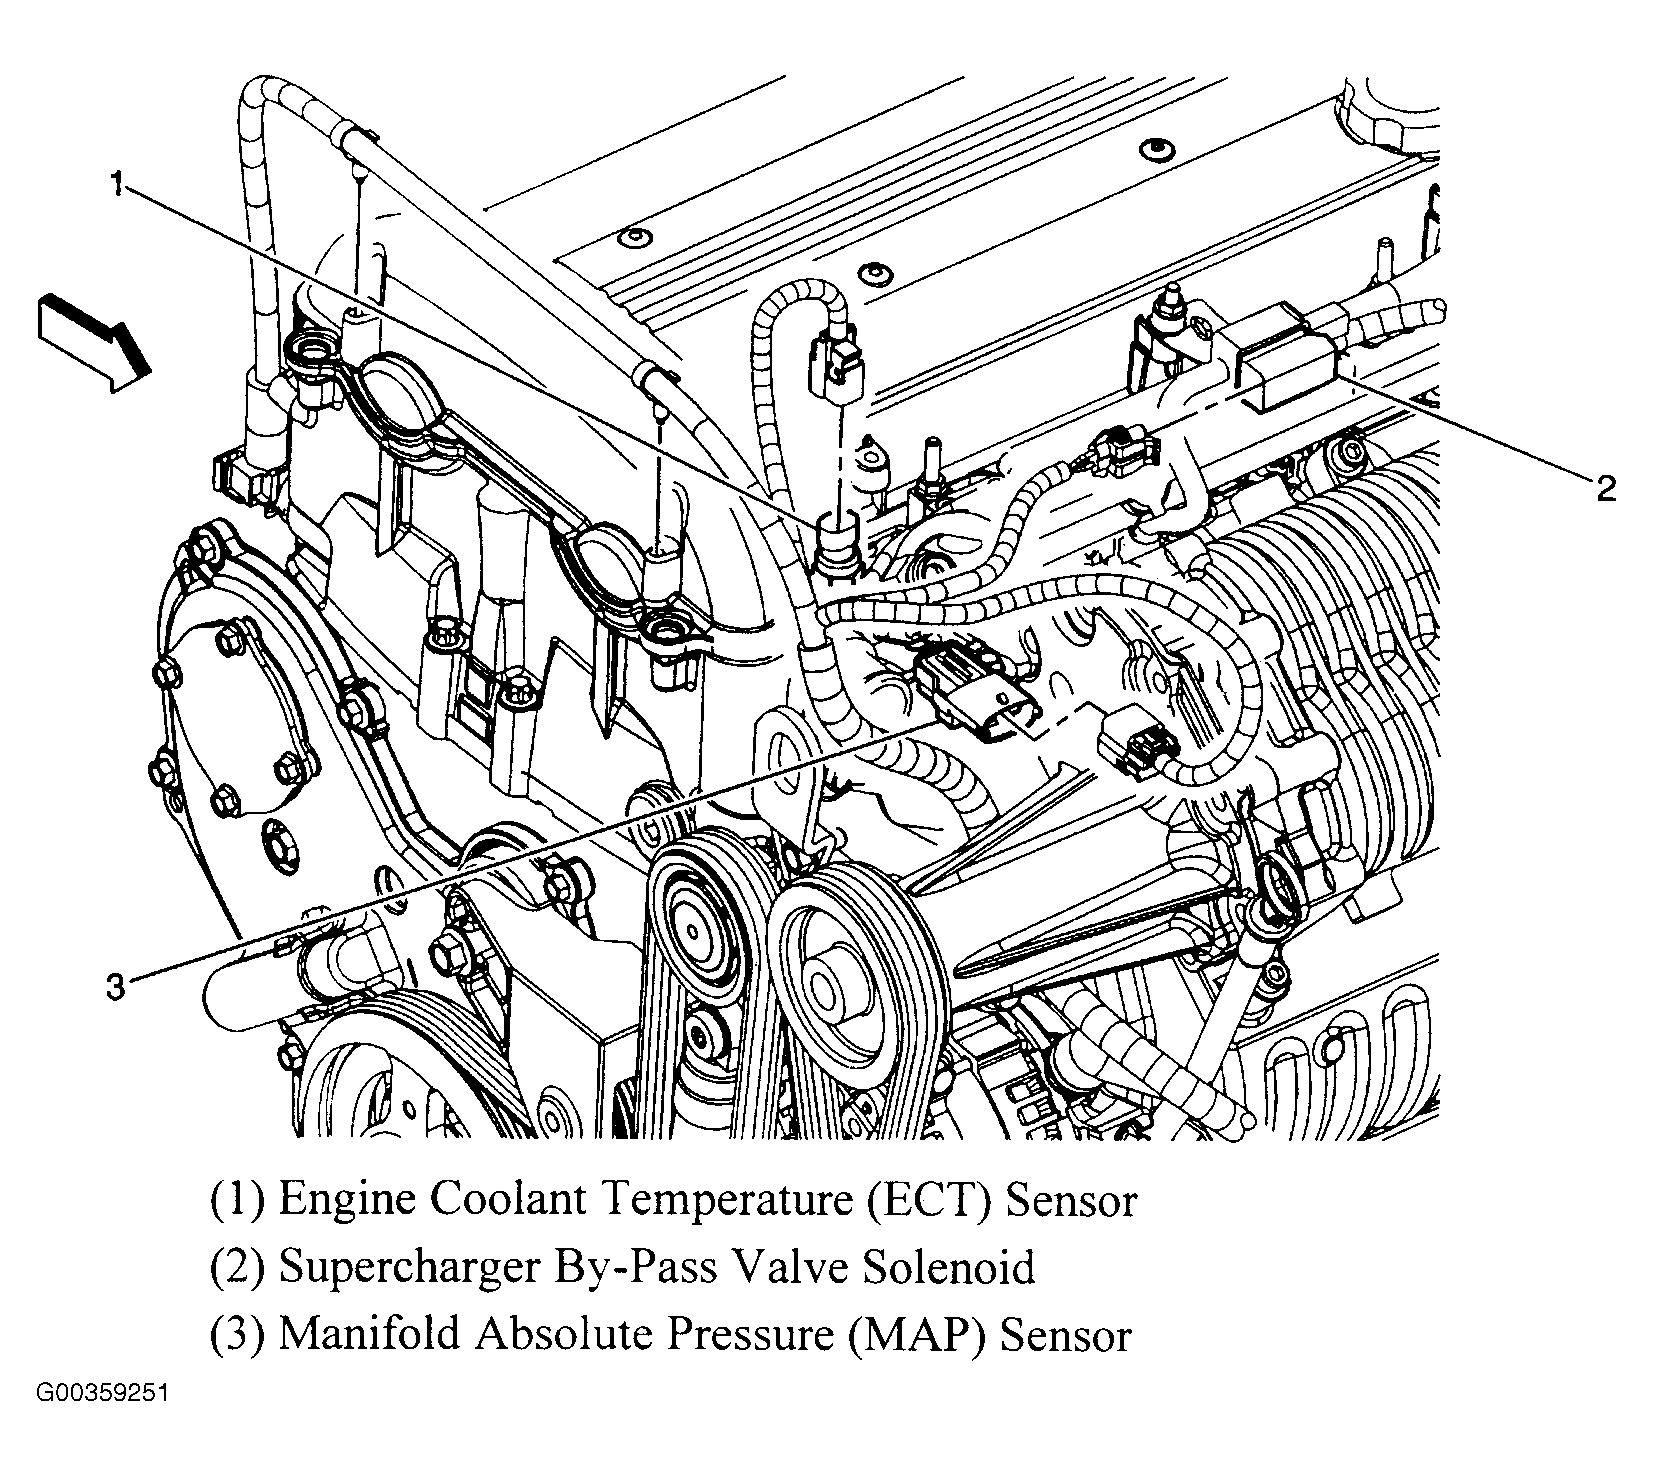 hight resolution of 2006 saturn vue 2 2 engine diagram wiring diagram toolbox ion 2 2 engine diagram sensors